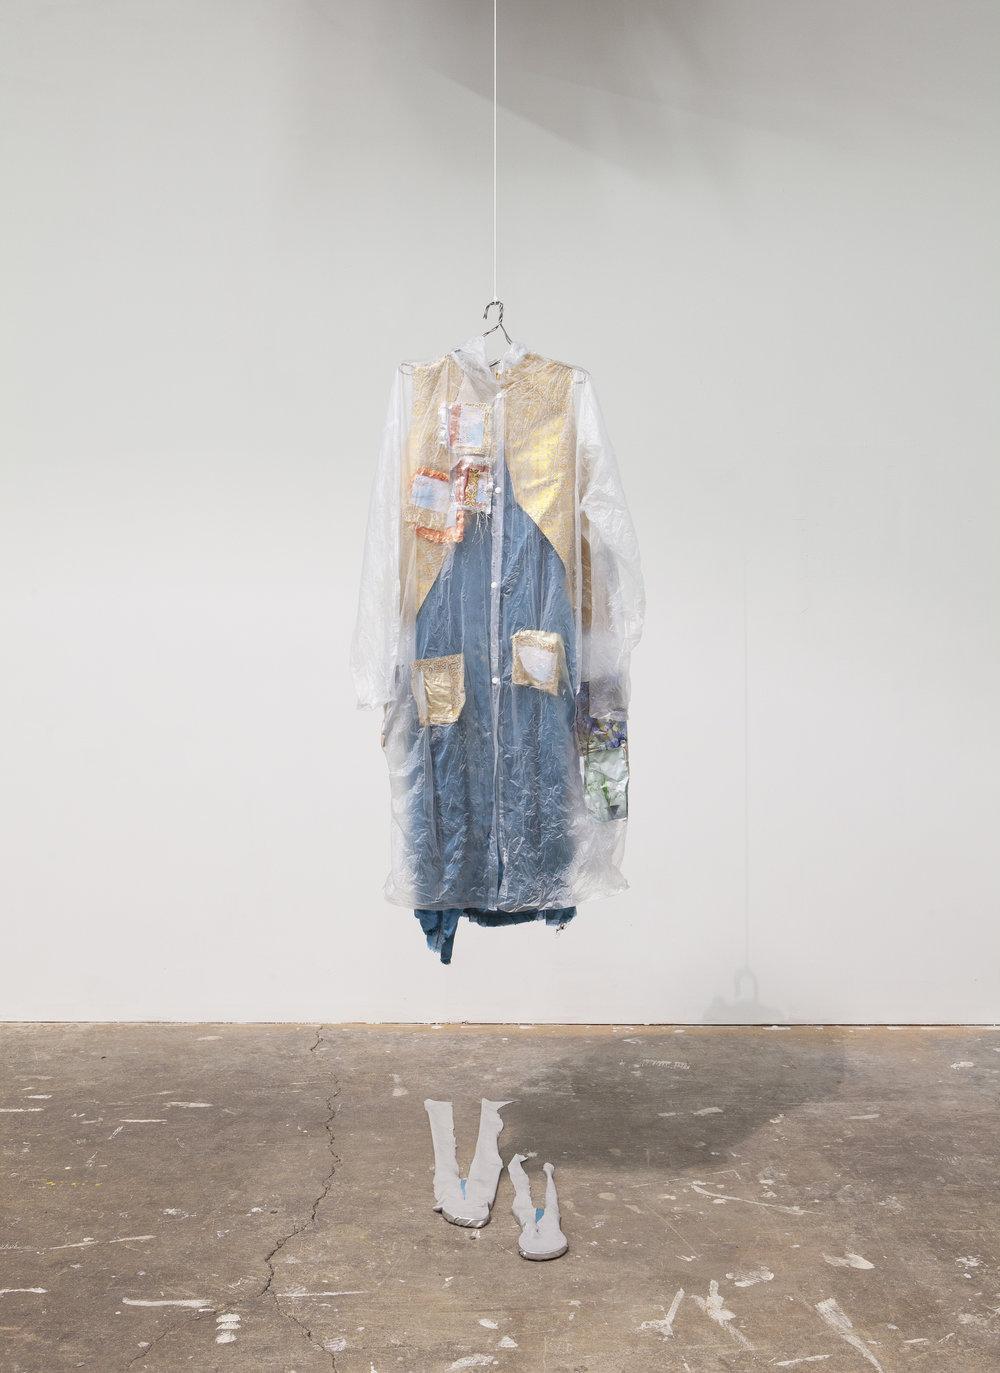 Sofia Paris   Ghost 2,  2019 Mixed media 48 x 22 inches 121.9 x 55.9 cm